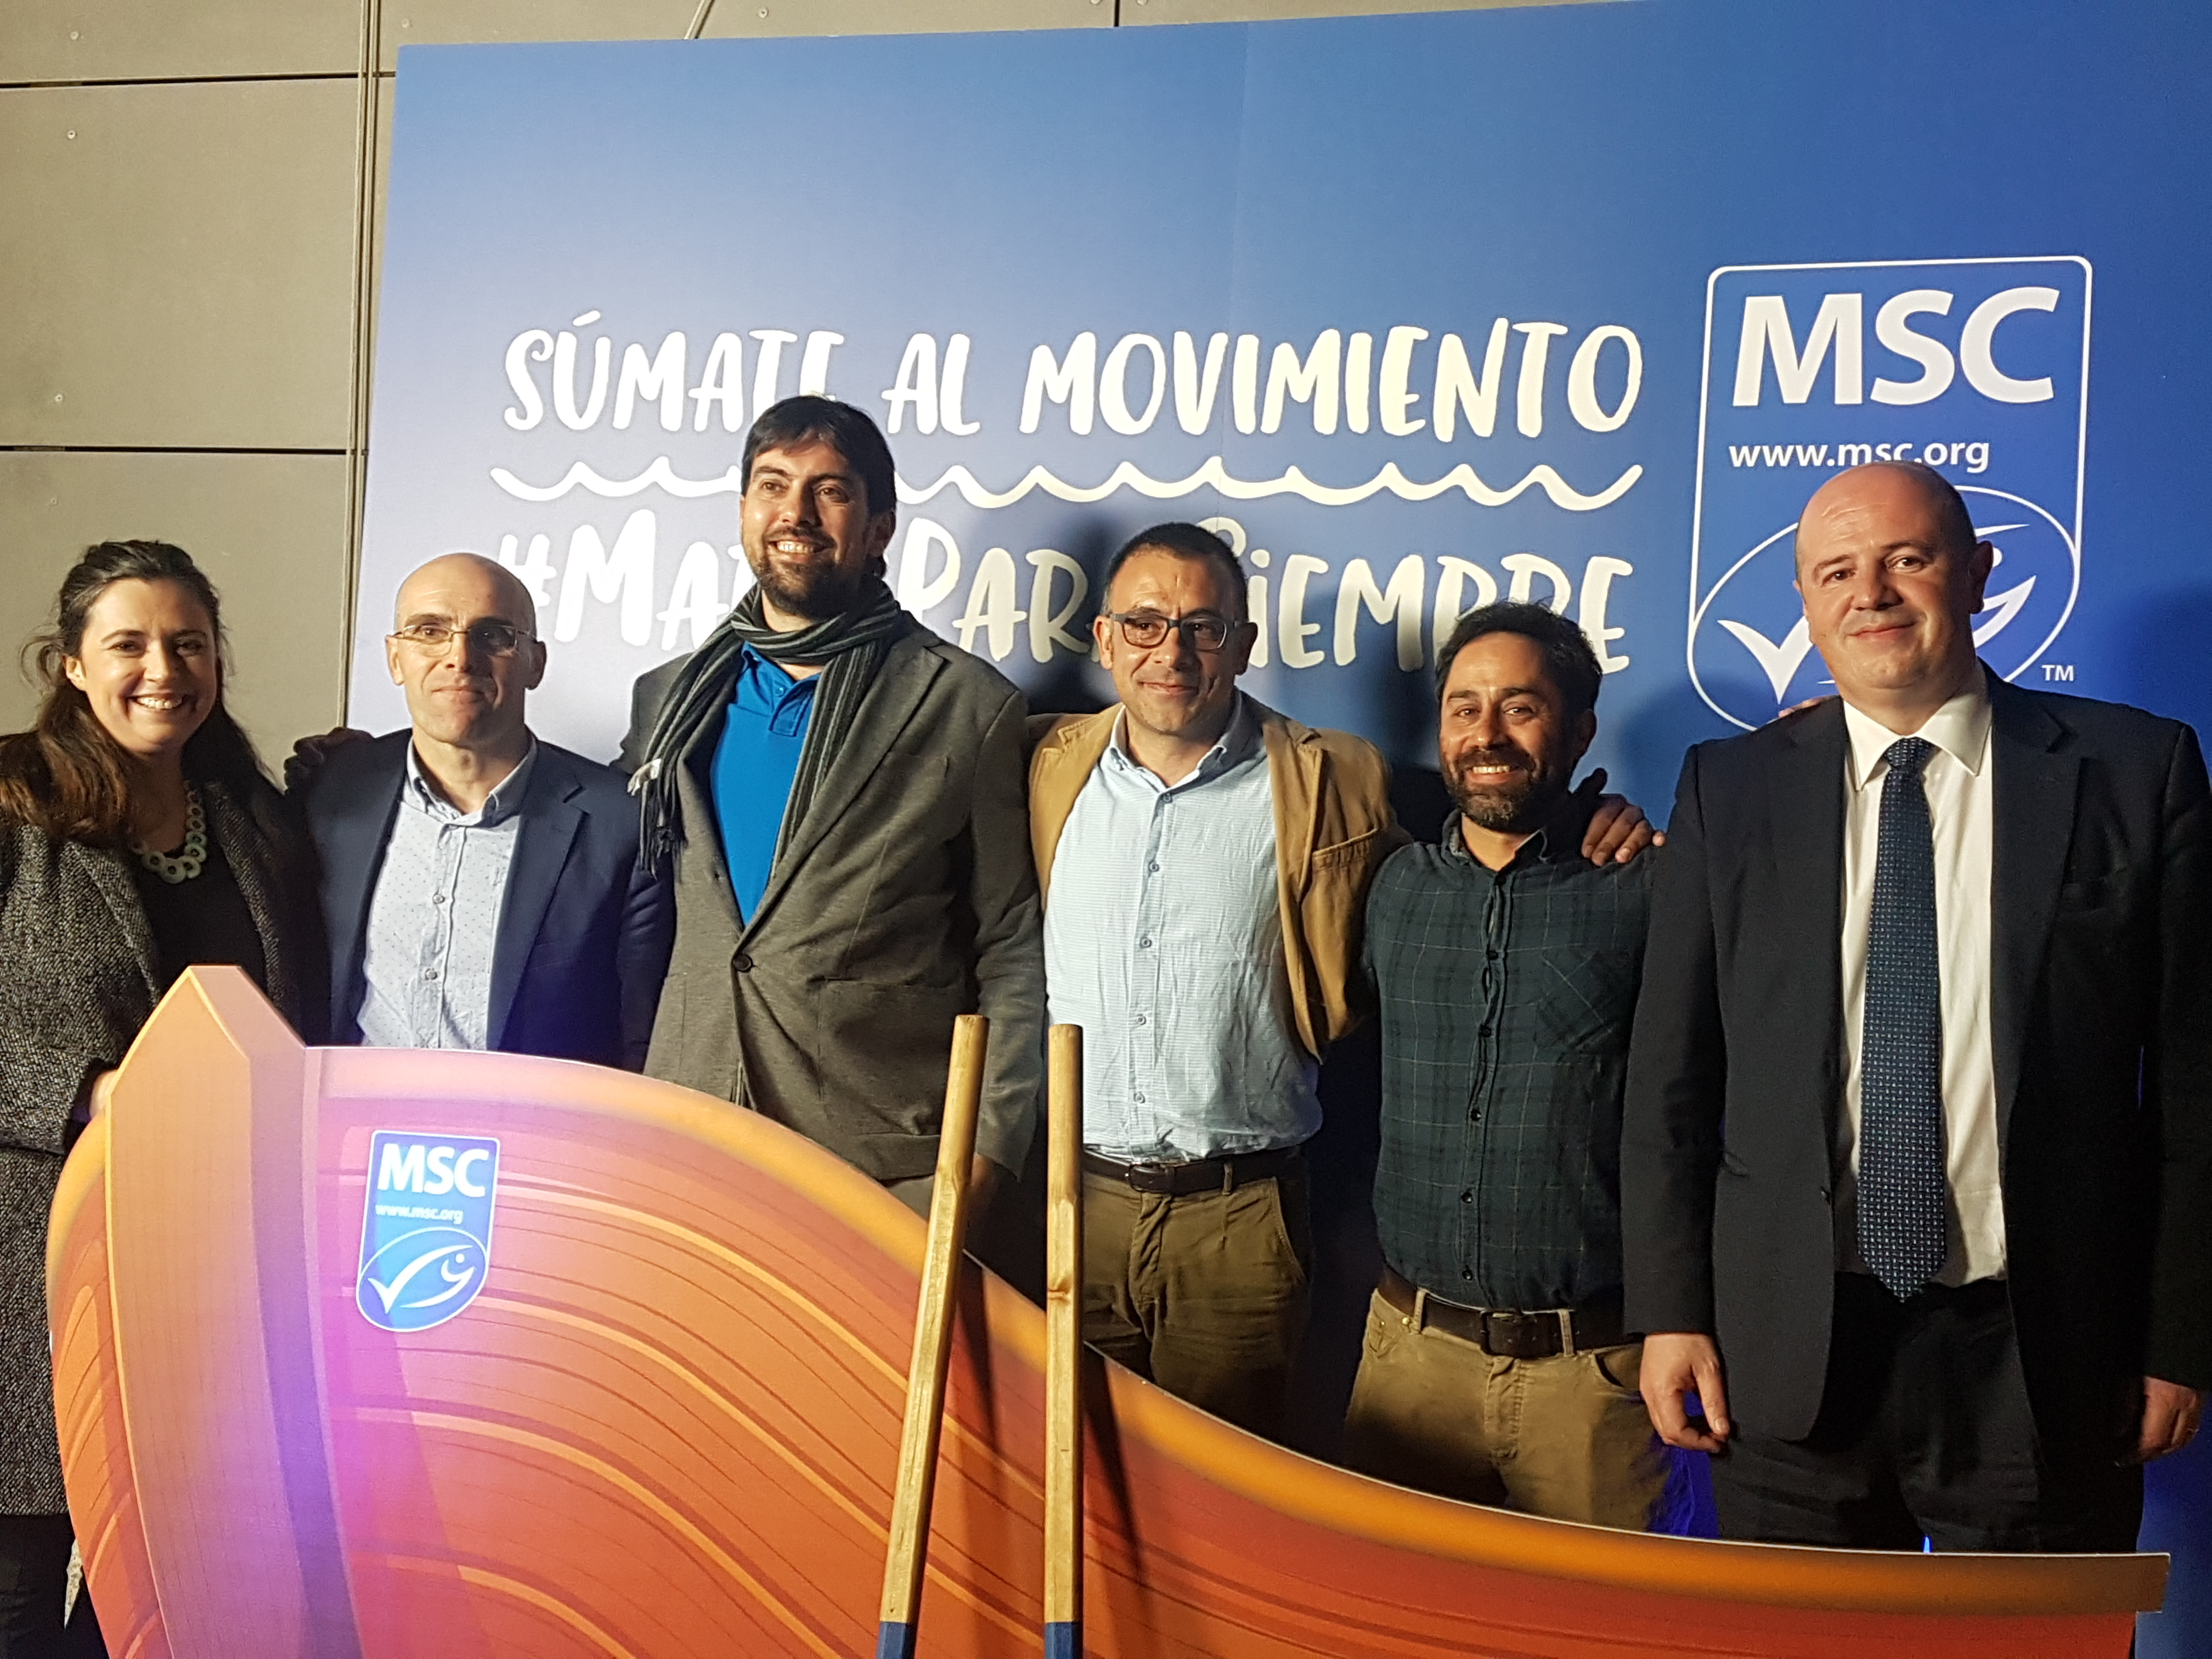 Premios_MaresParaSiempre_Oroz6.jpg